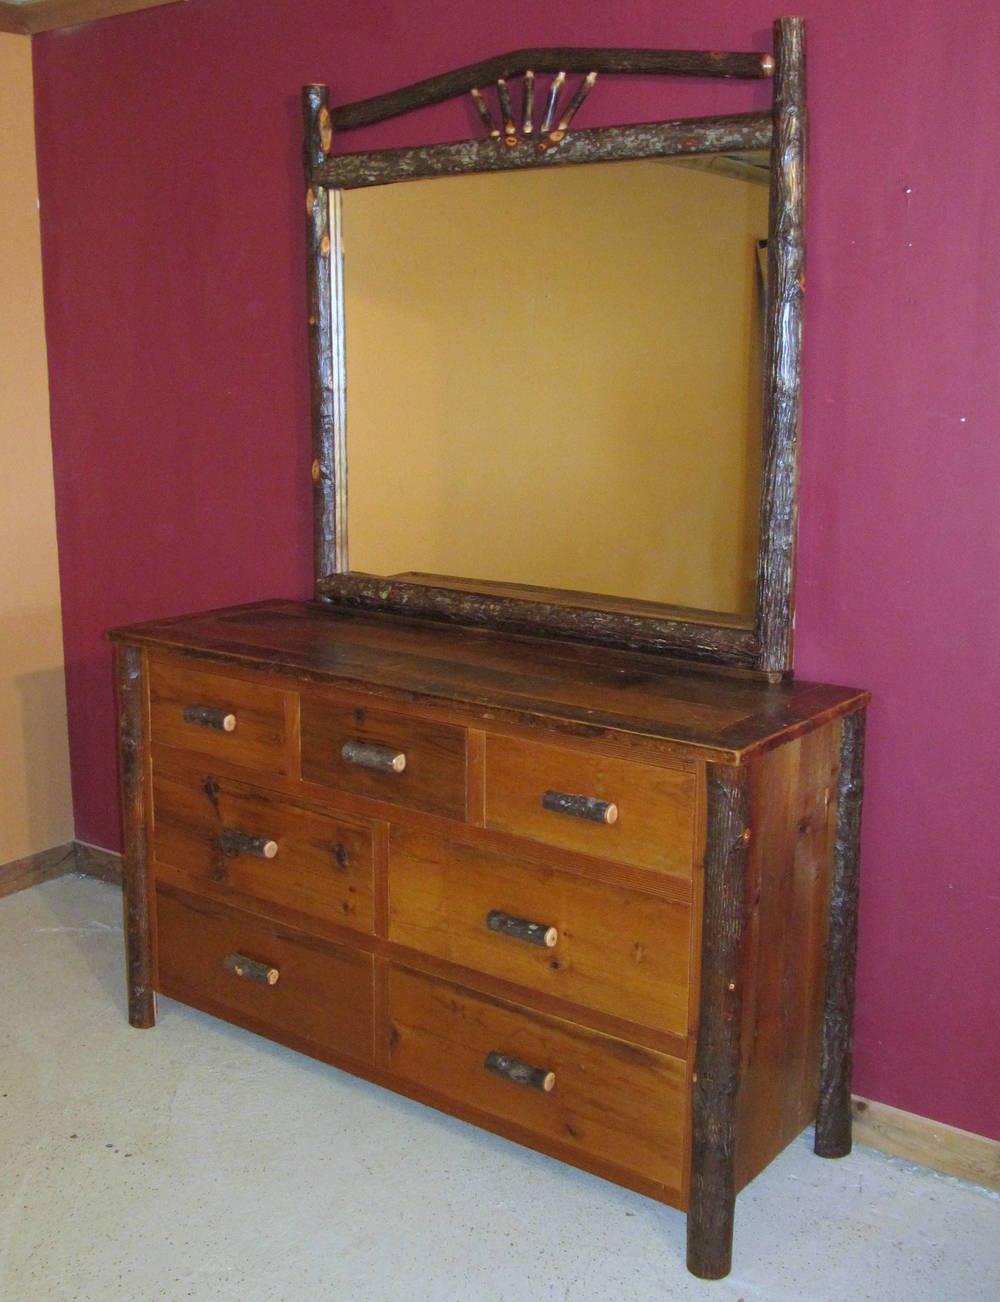 hickory-dresser-mirror-sunburst.jpg